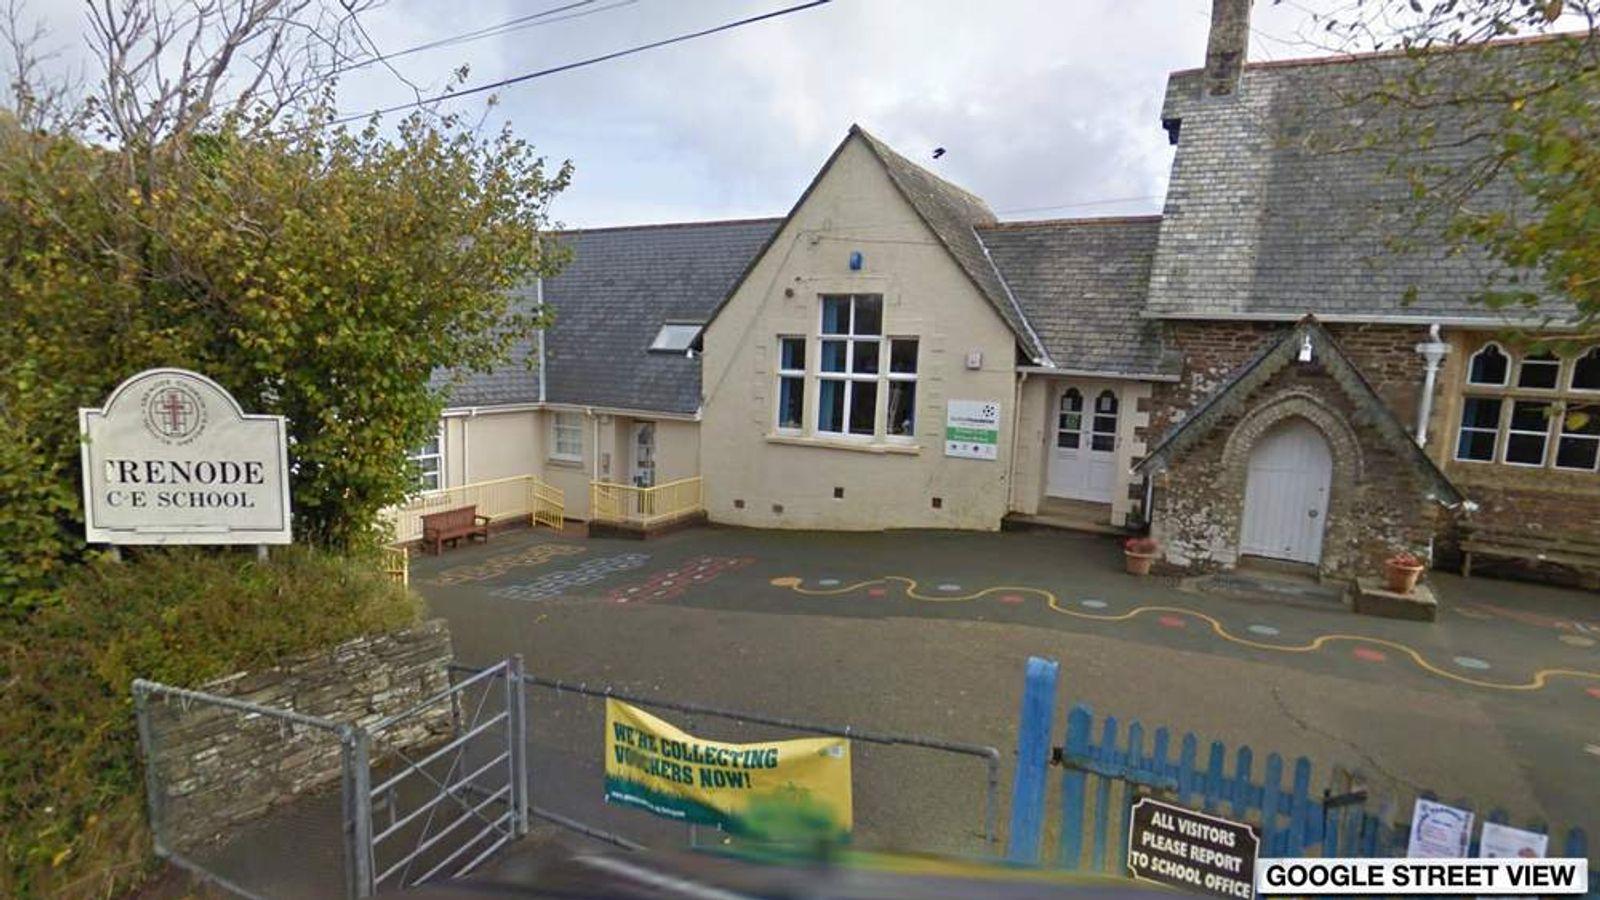 Google street view of Trenode C of E school